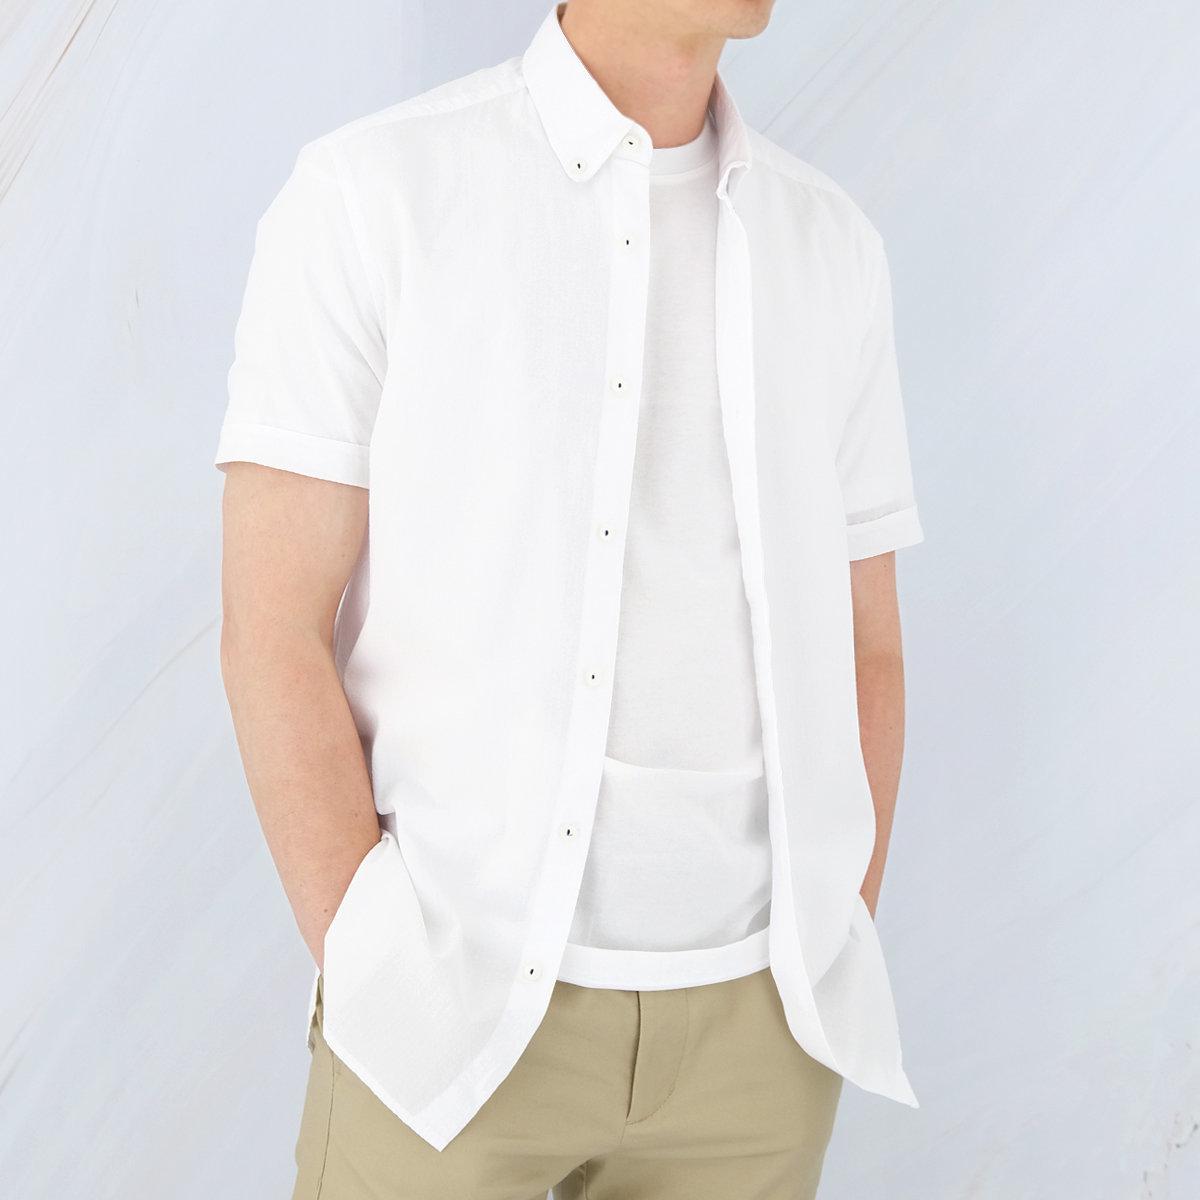 Men's Cotton Short Sleeves Shirt (White)